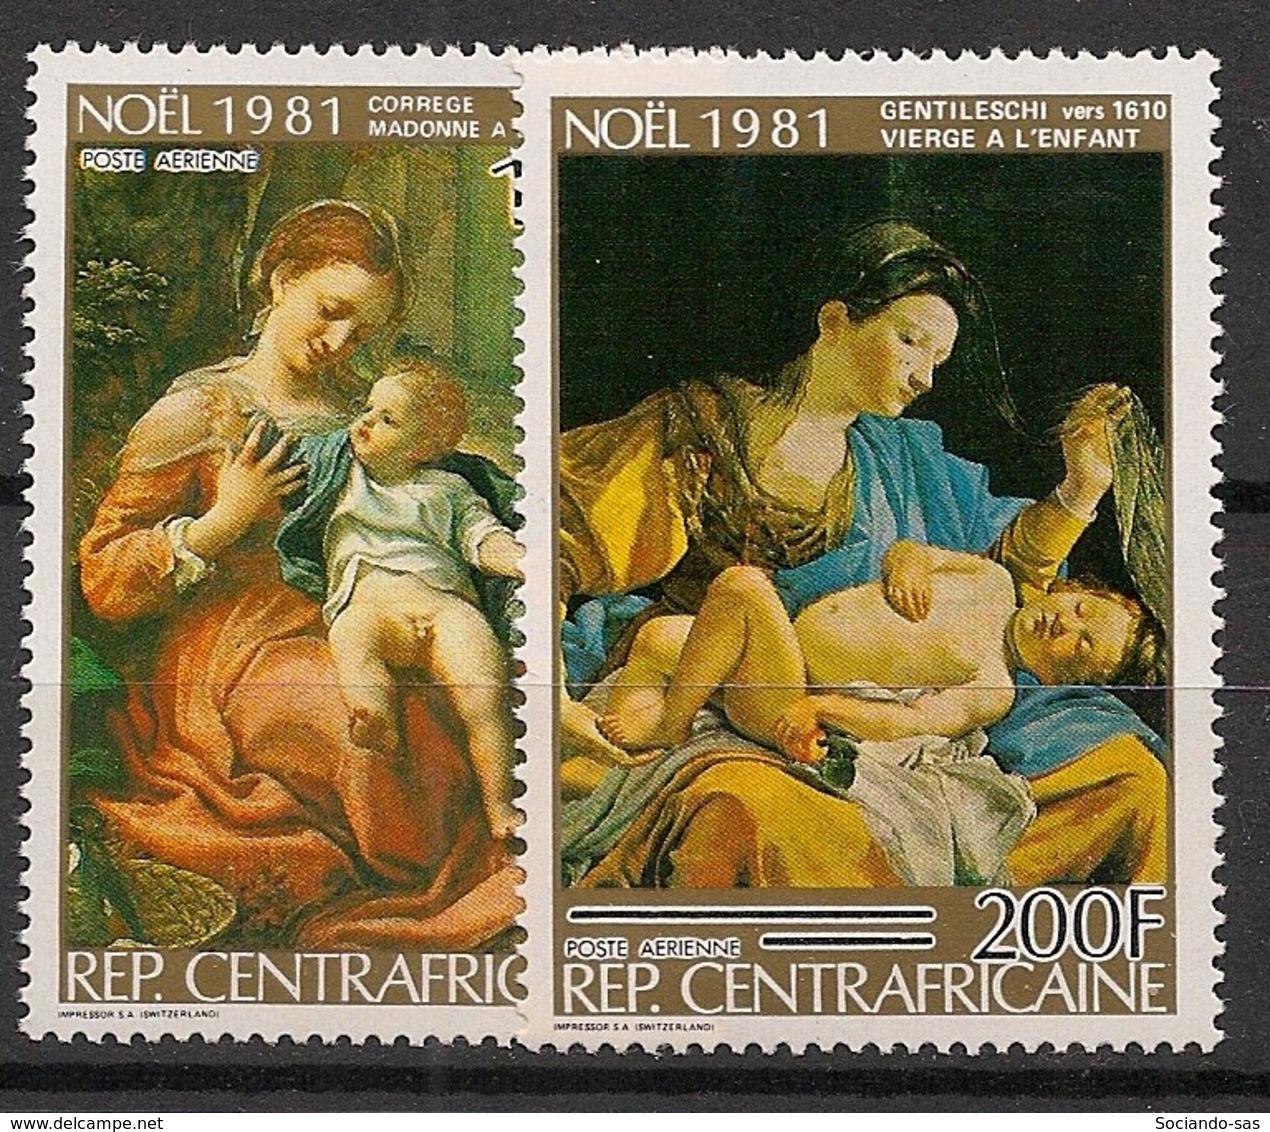 Centrafricaine - 1981 - Poste Aérienne PA N°Yv. 249 à 250 - Noel - Neuf Luxe ** / MNH / Postfrisch - Zentralafrik. Republik